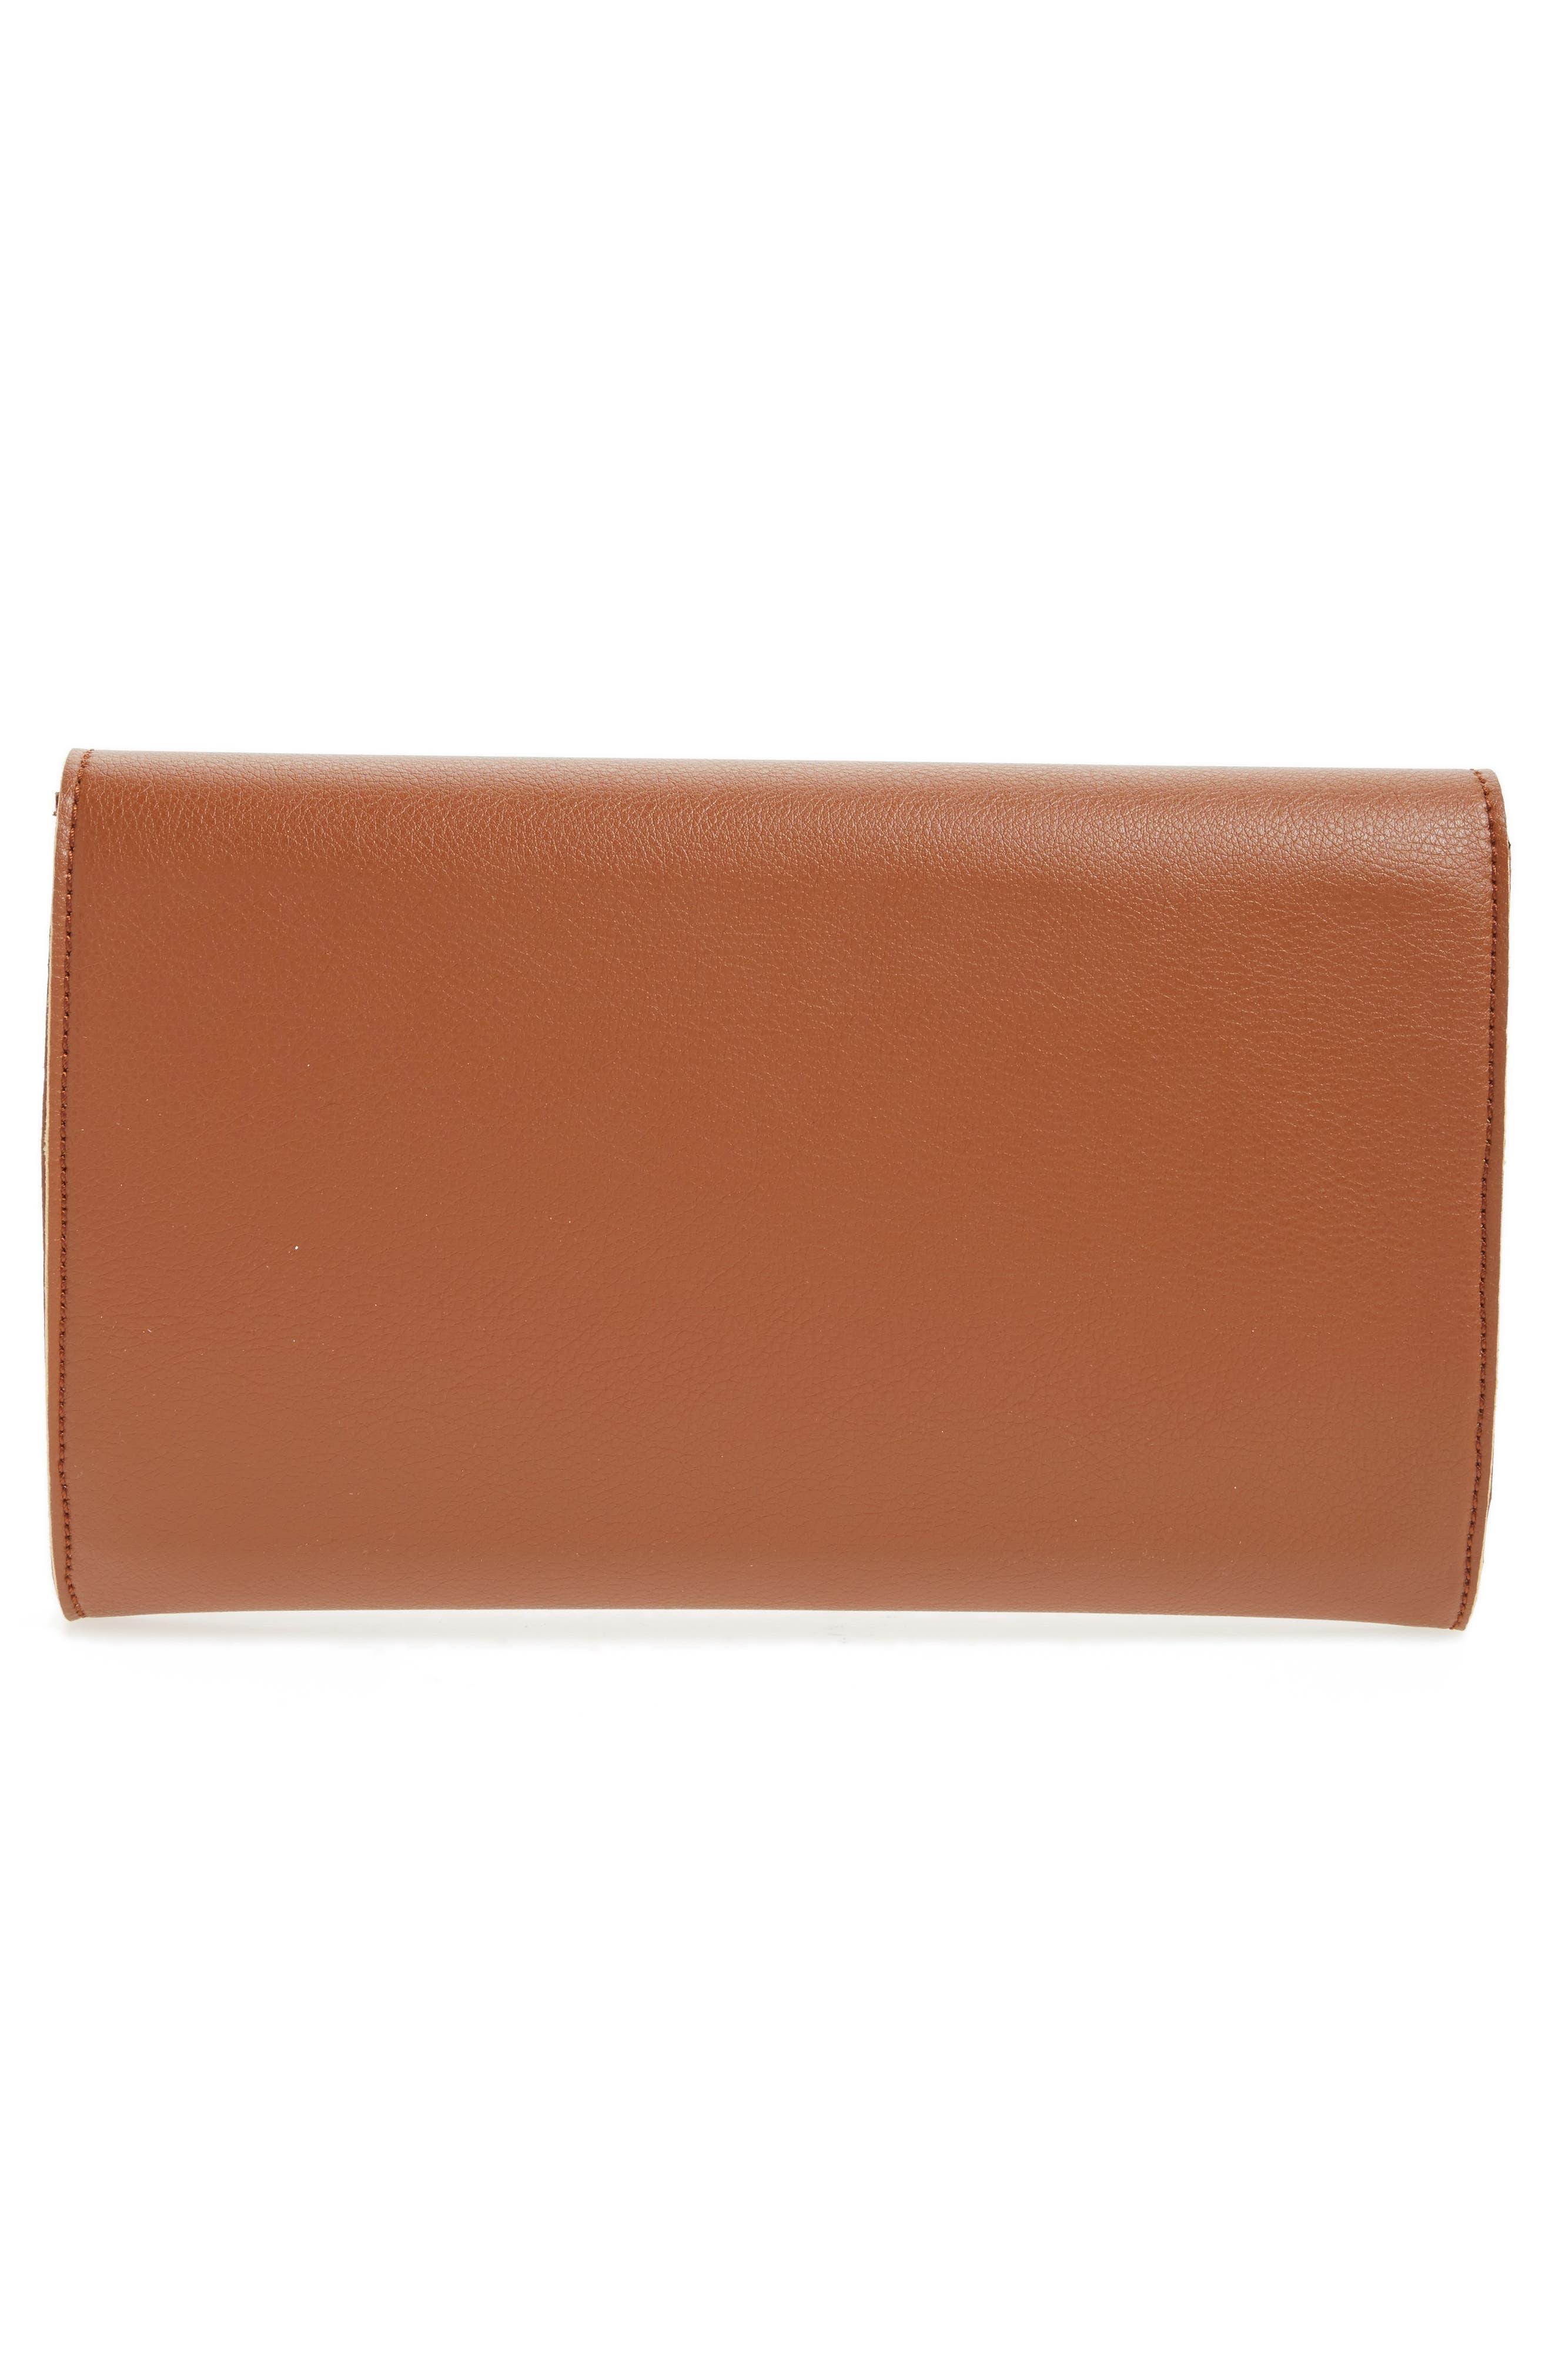 Chain Faux Leather Envelope Clutch,                             Alternate thumbnail 3, color,                             200